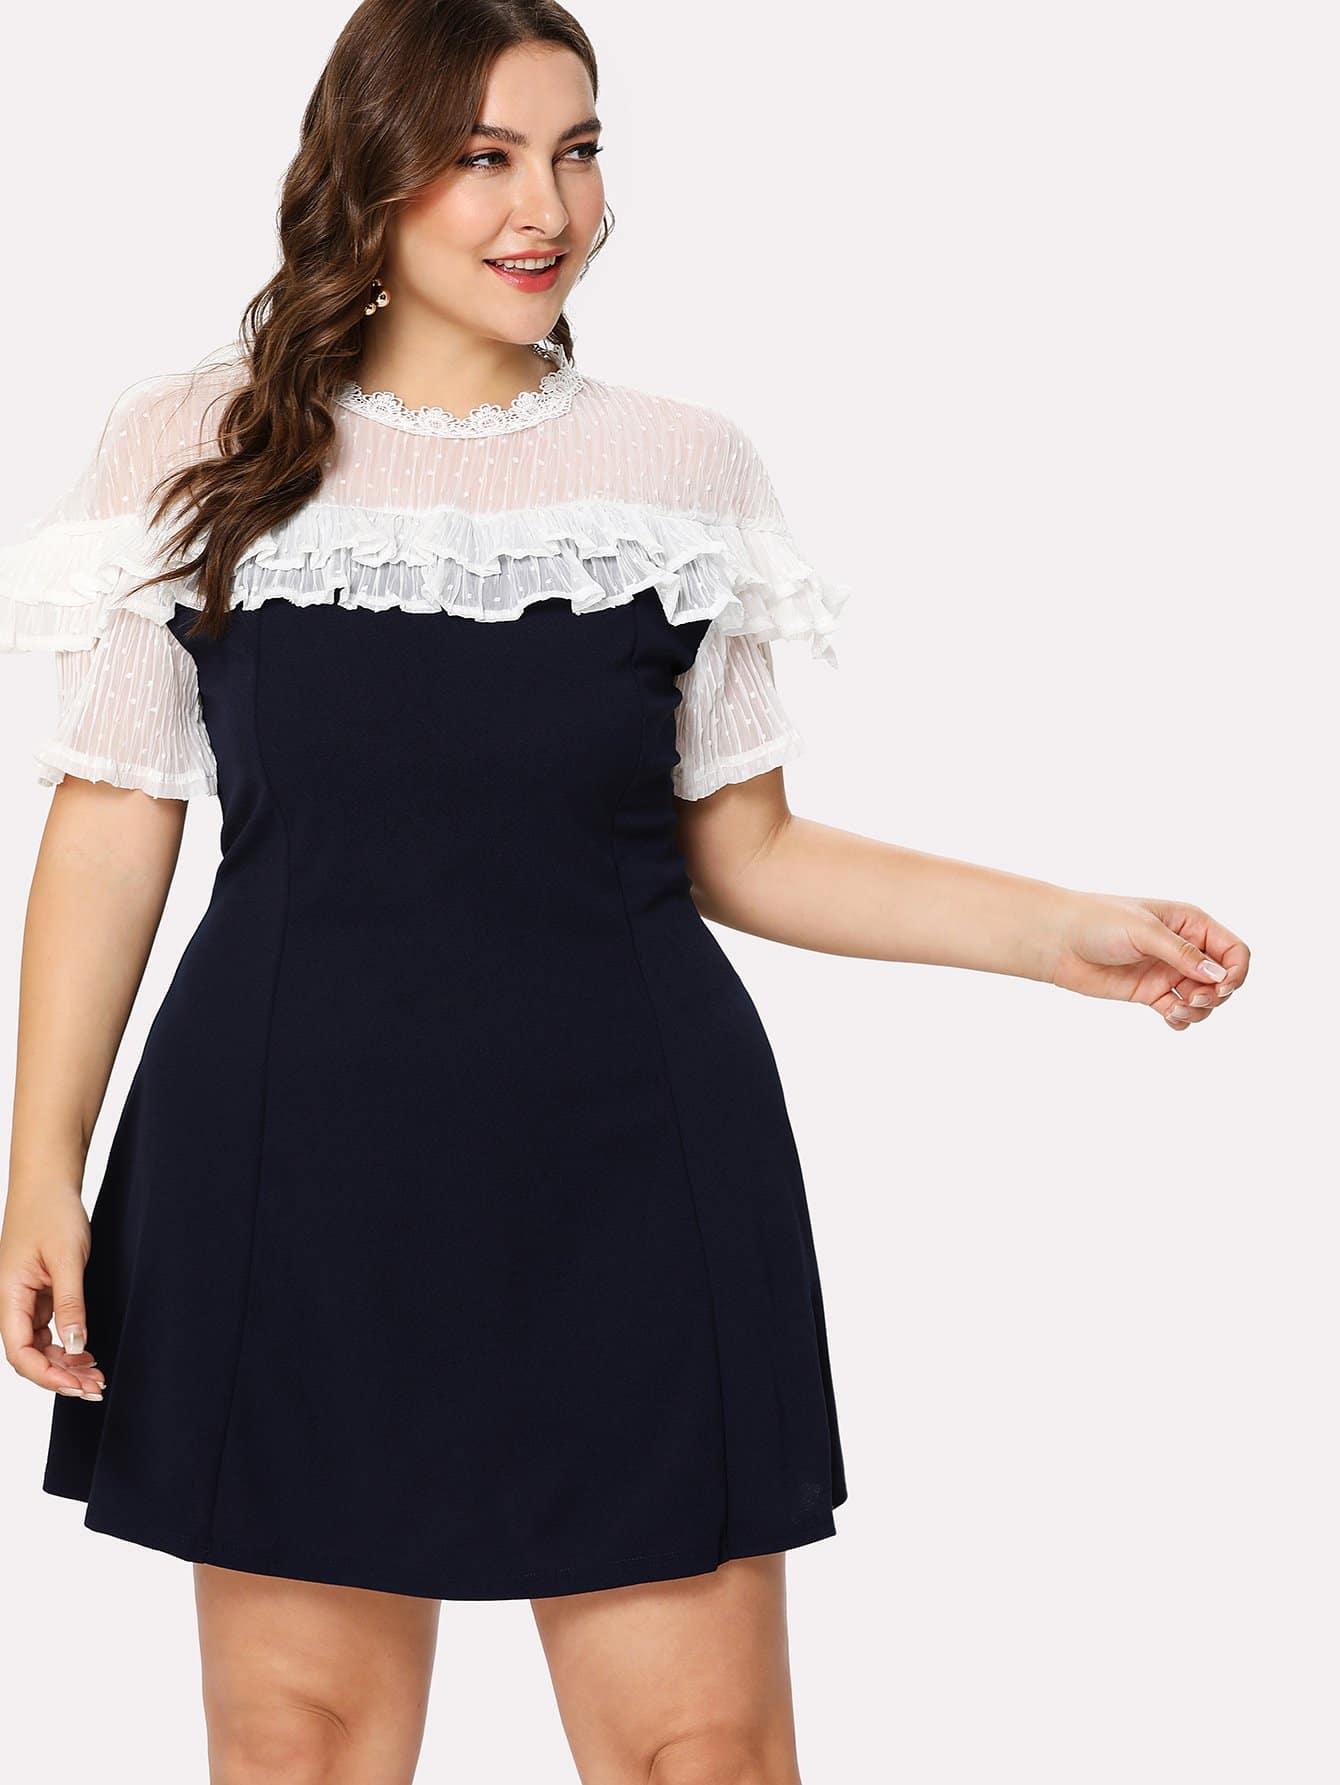 Sheer Mesh Panel Ruffle Trim Dress